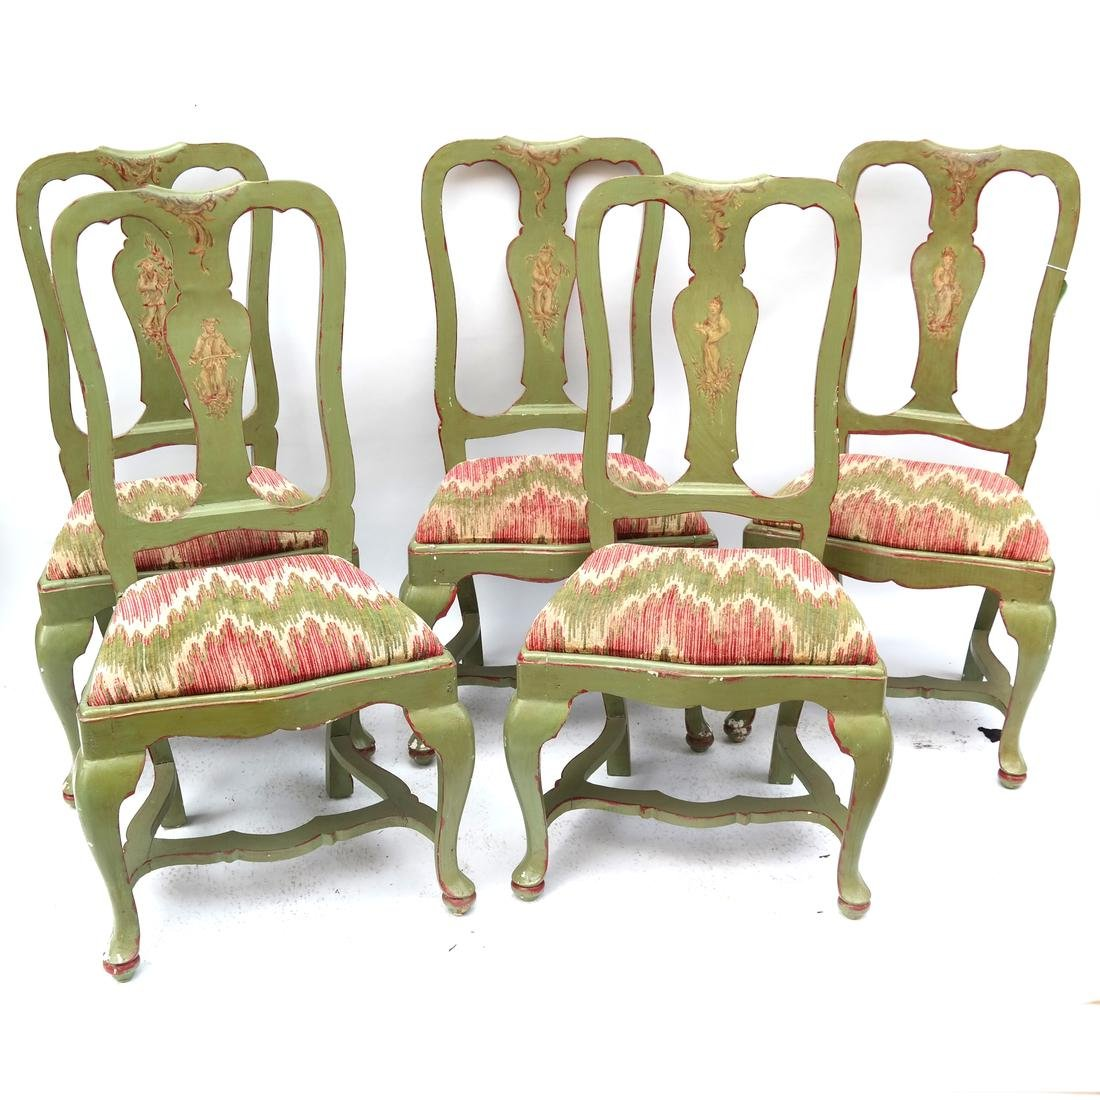 Set of 5 Italian Side Chairs 18th Century